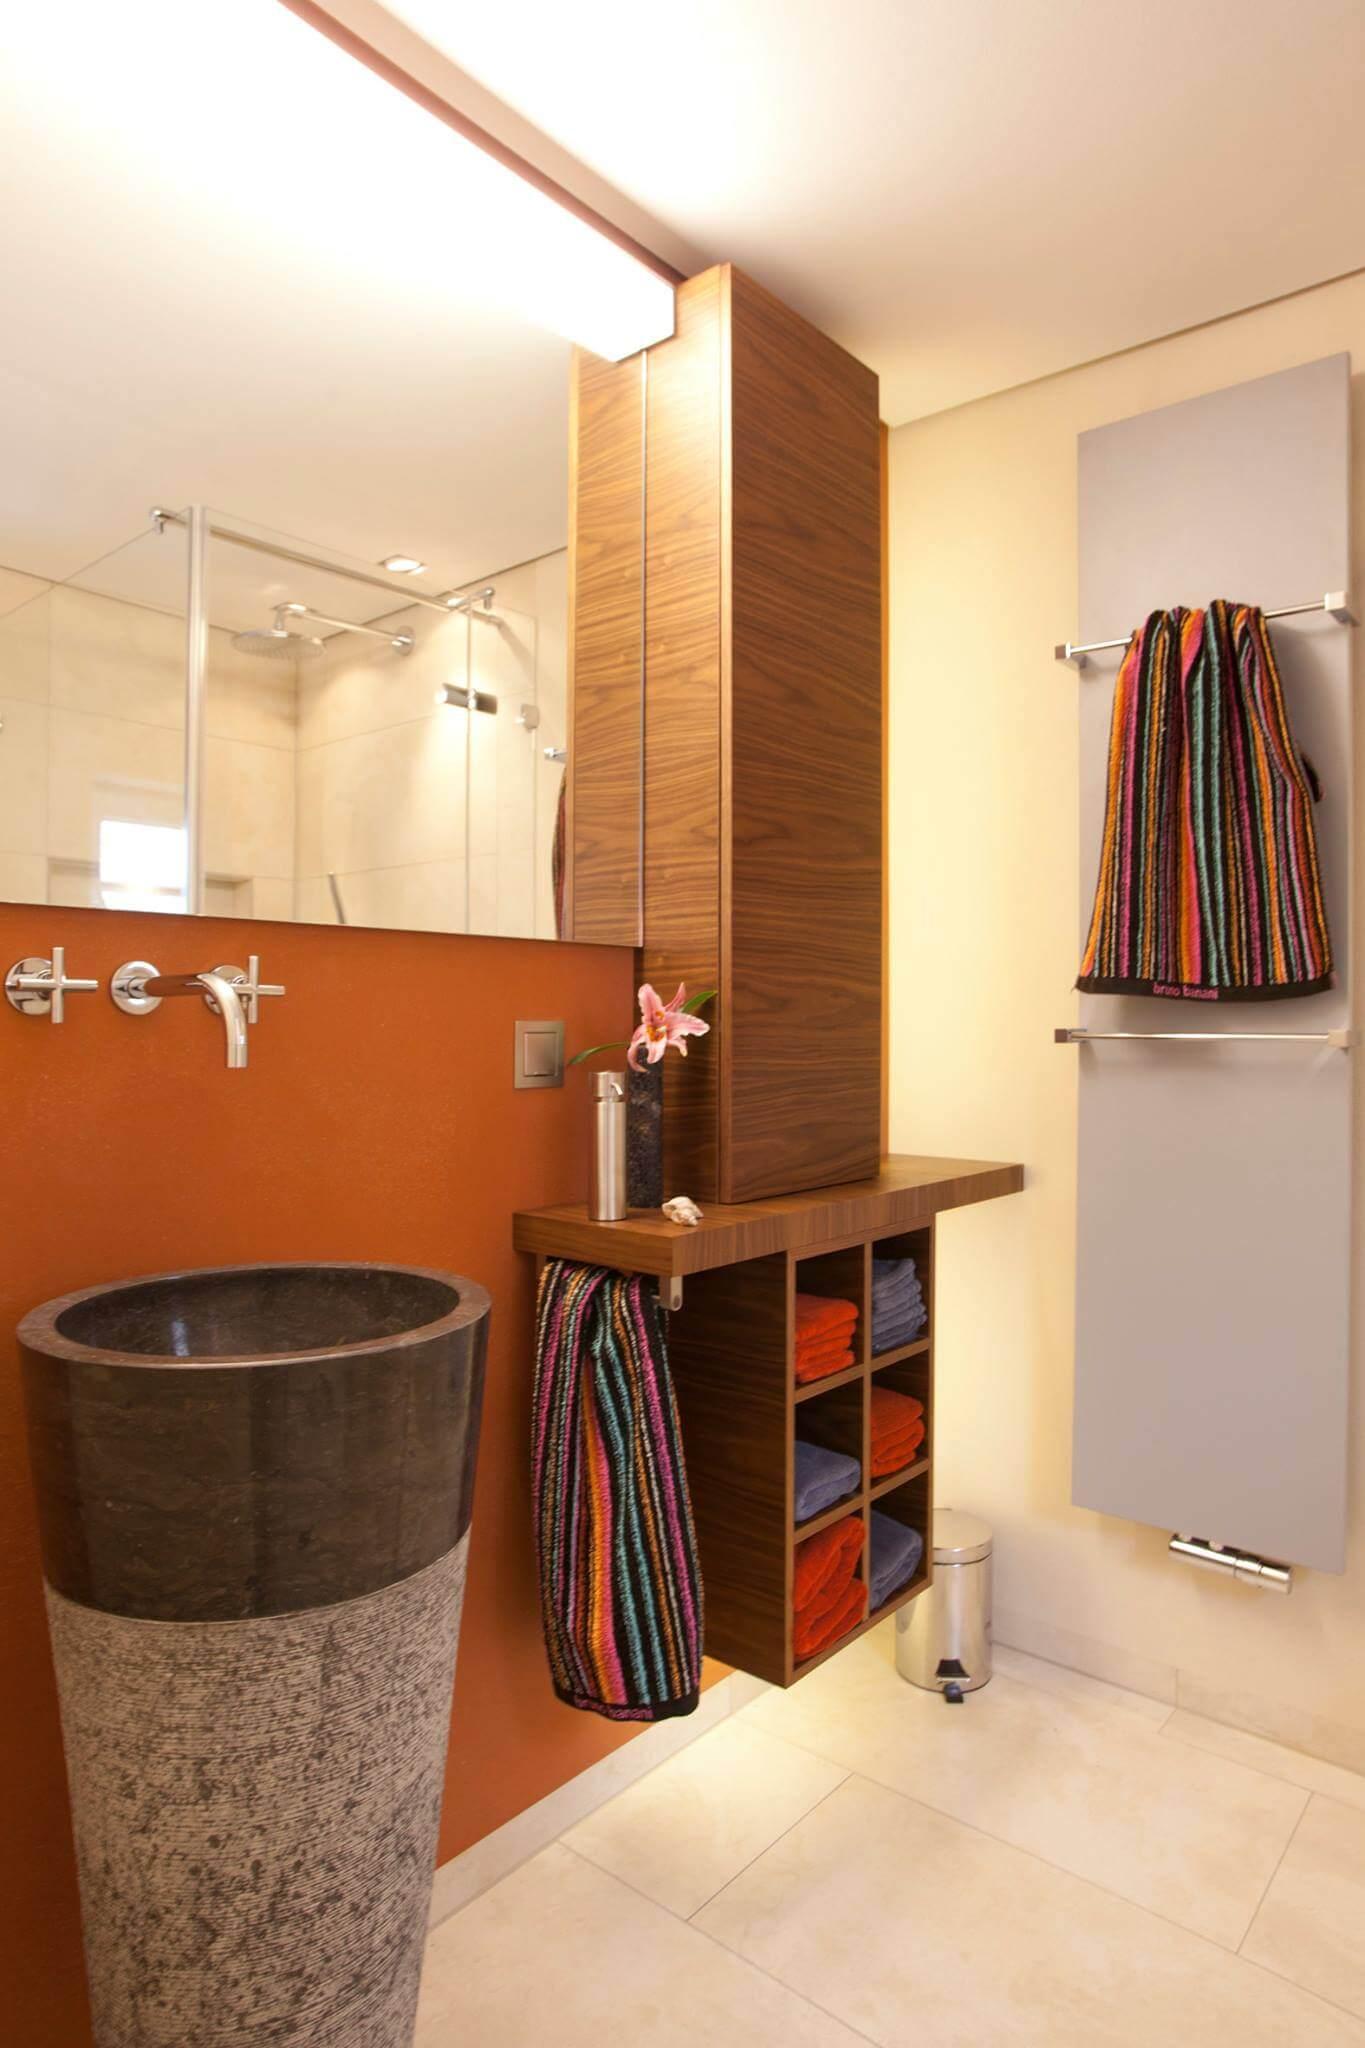 Bad Godesberg,Bad Honnef,Badezimmer,Designerbad,Gäste WC,Gästebad,Gästebad